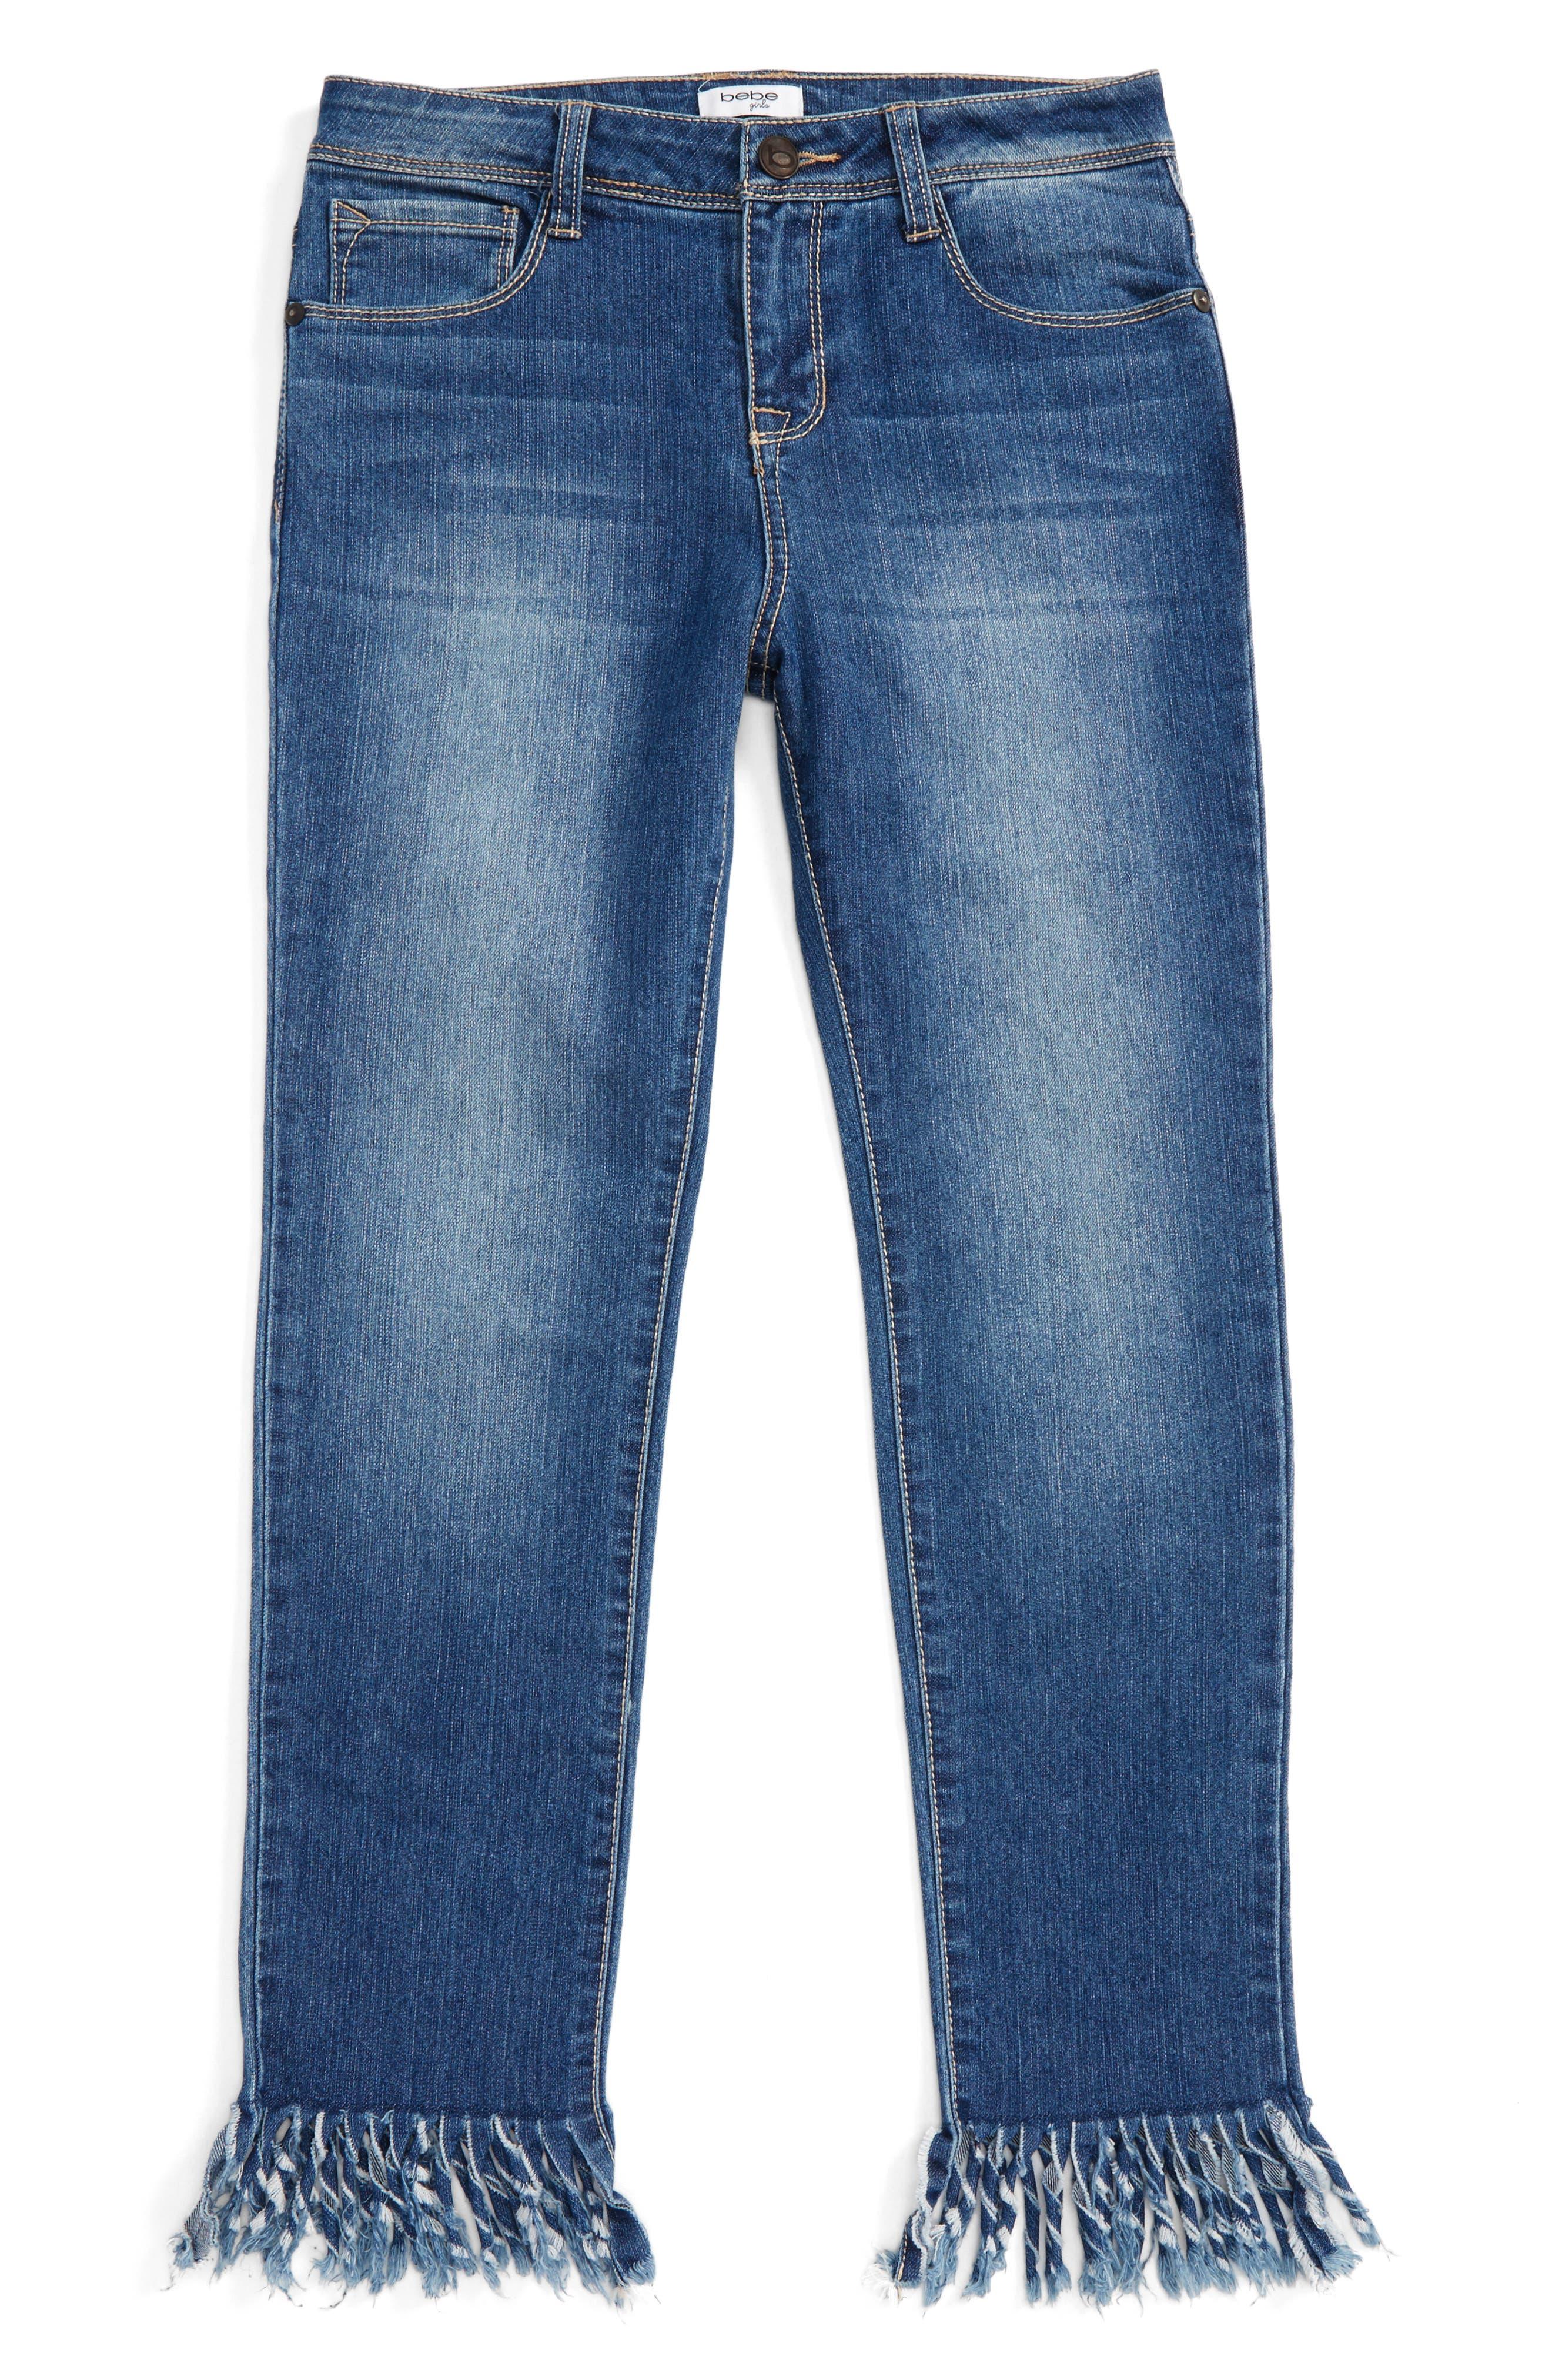 Fringe Jeans,                             Main thumbnail 1, color,                             Med Stone